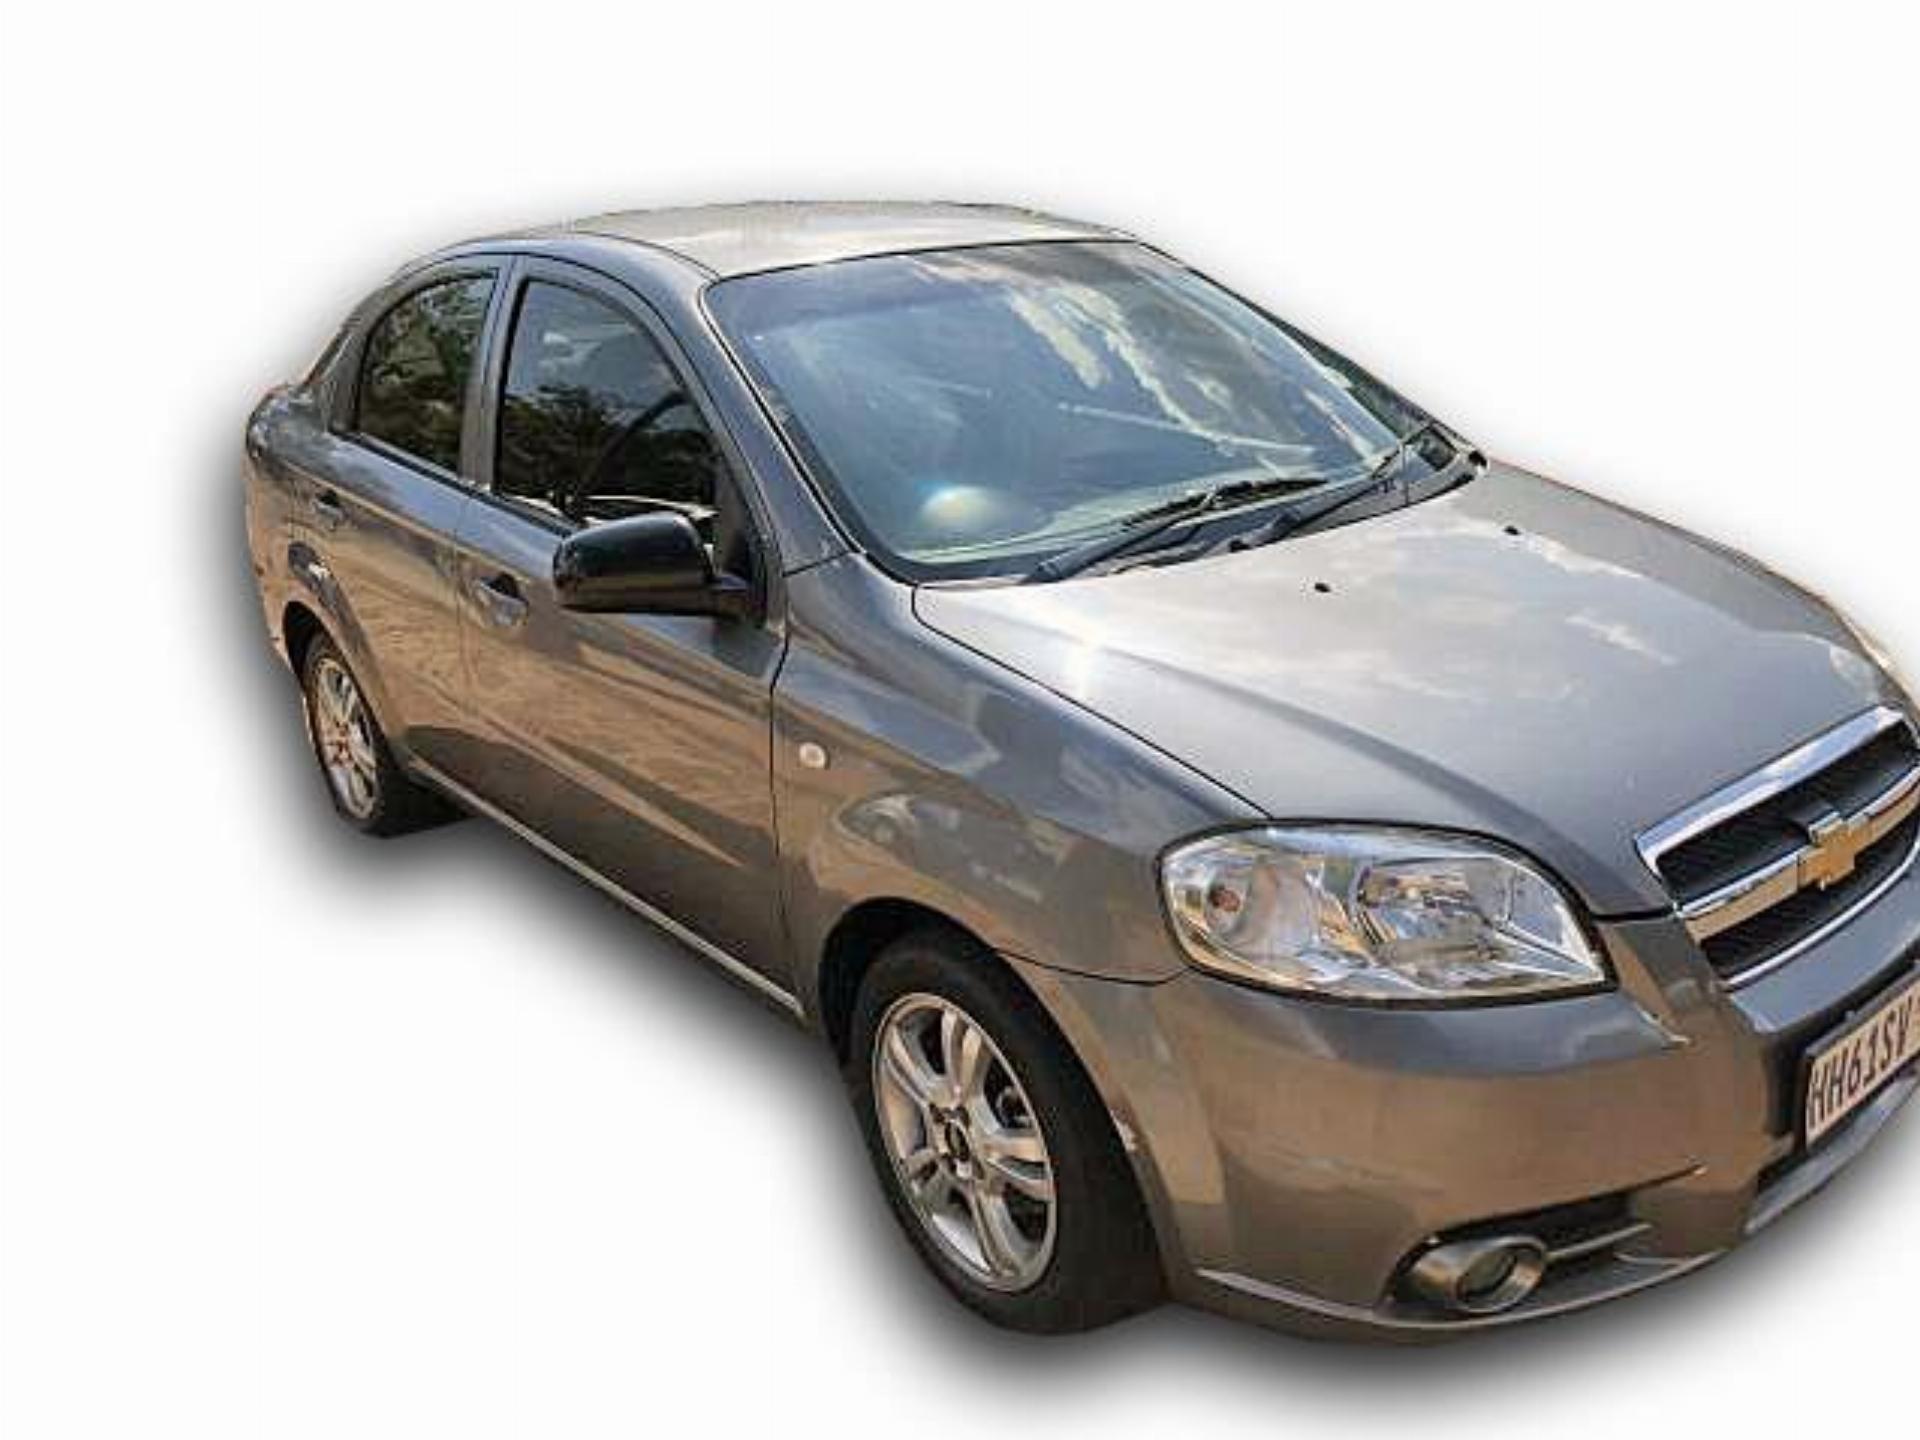 Chevrolet Aveo 1.6 LS - Sedan